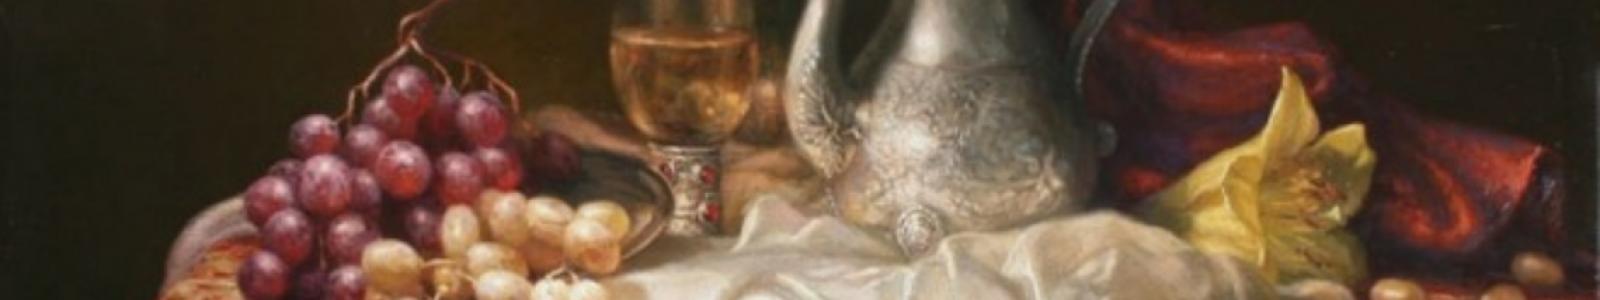 Gallery Painter Vera Ustinova